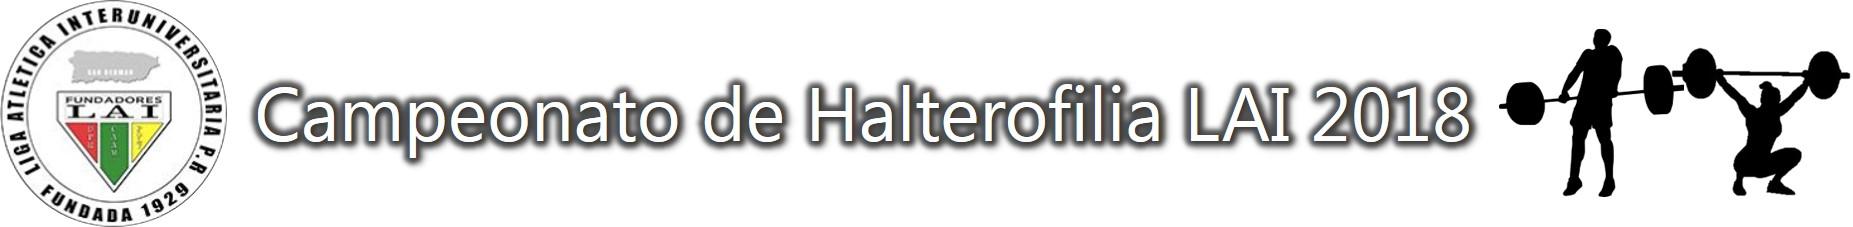 Imagen representativa al Campeonato de Halterofilia LAI 2018